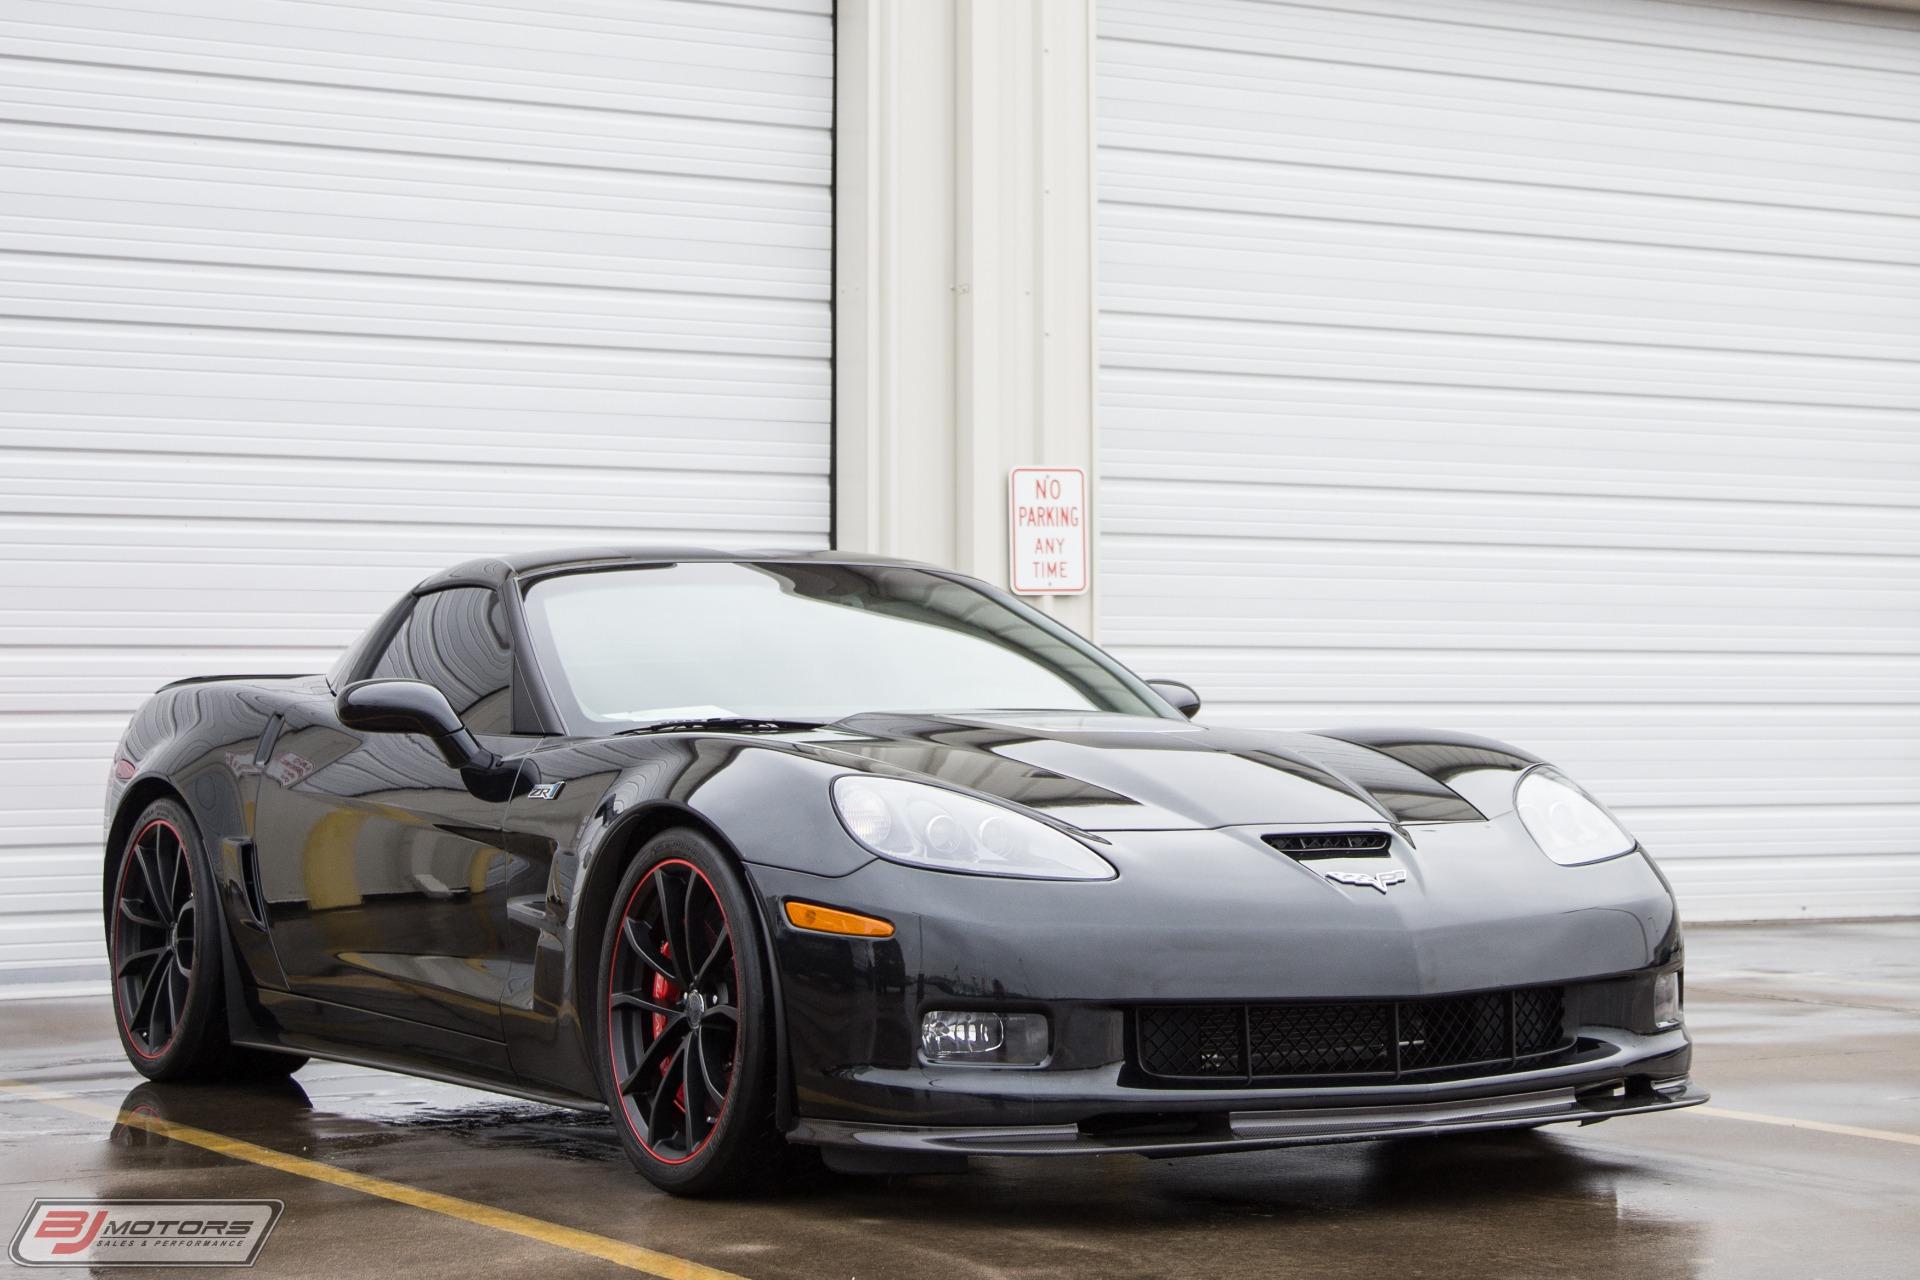 Used-2012-Chevrolet-Corvette-ZR1-Centennial-Special-Edition